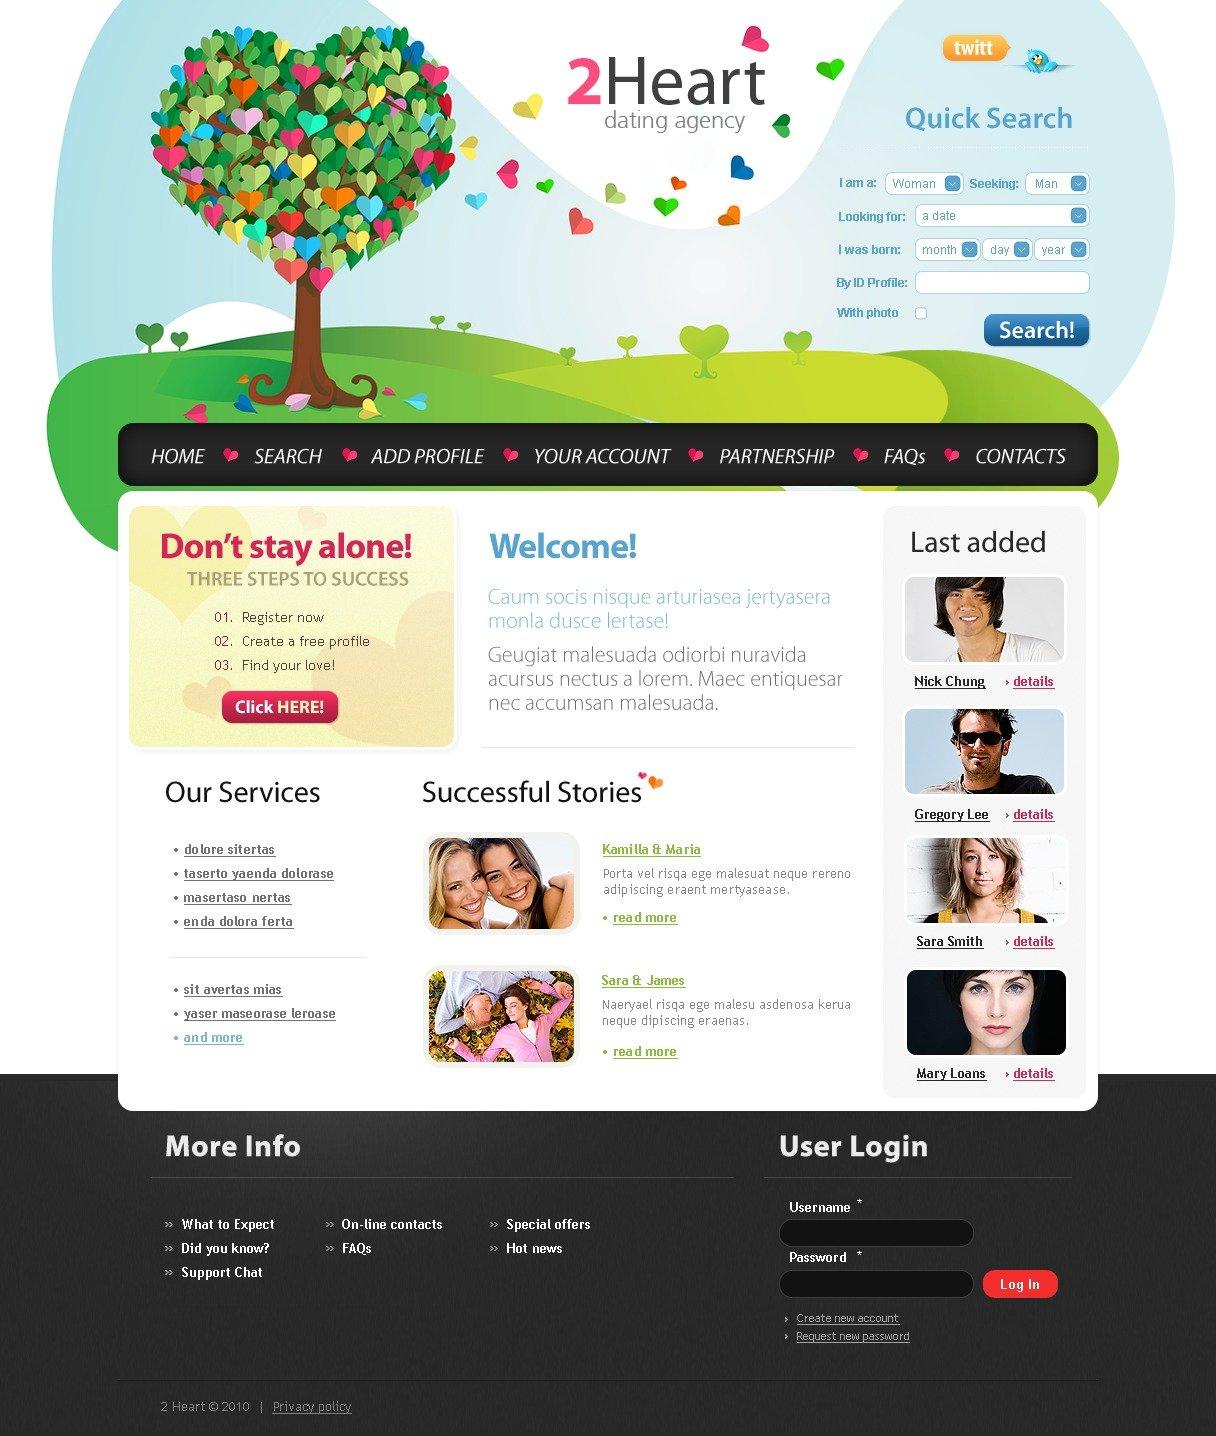 Sitio web de citas mujer de 40 Alcorcón-49408